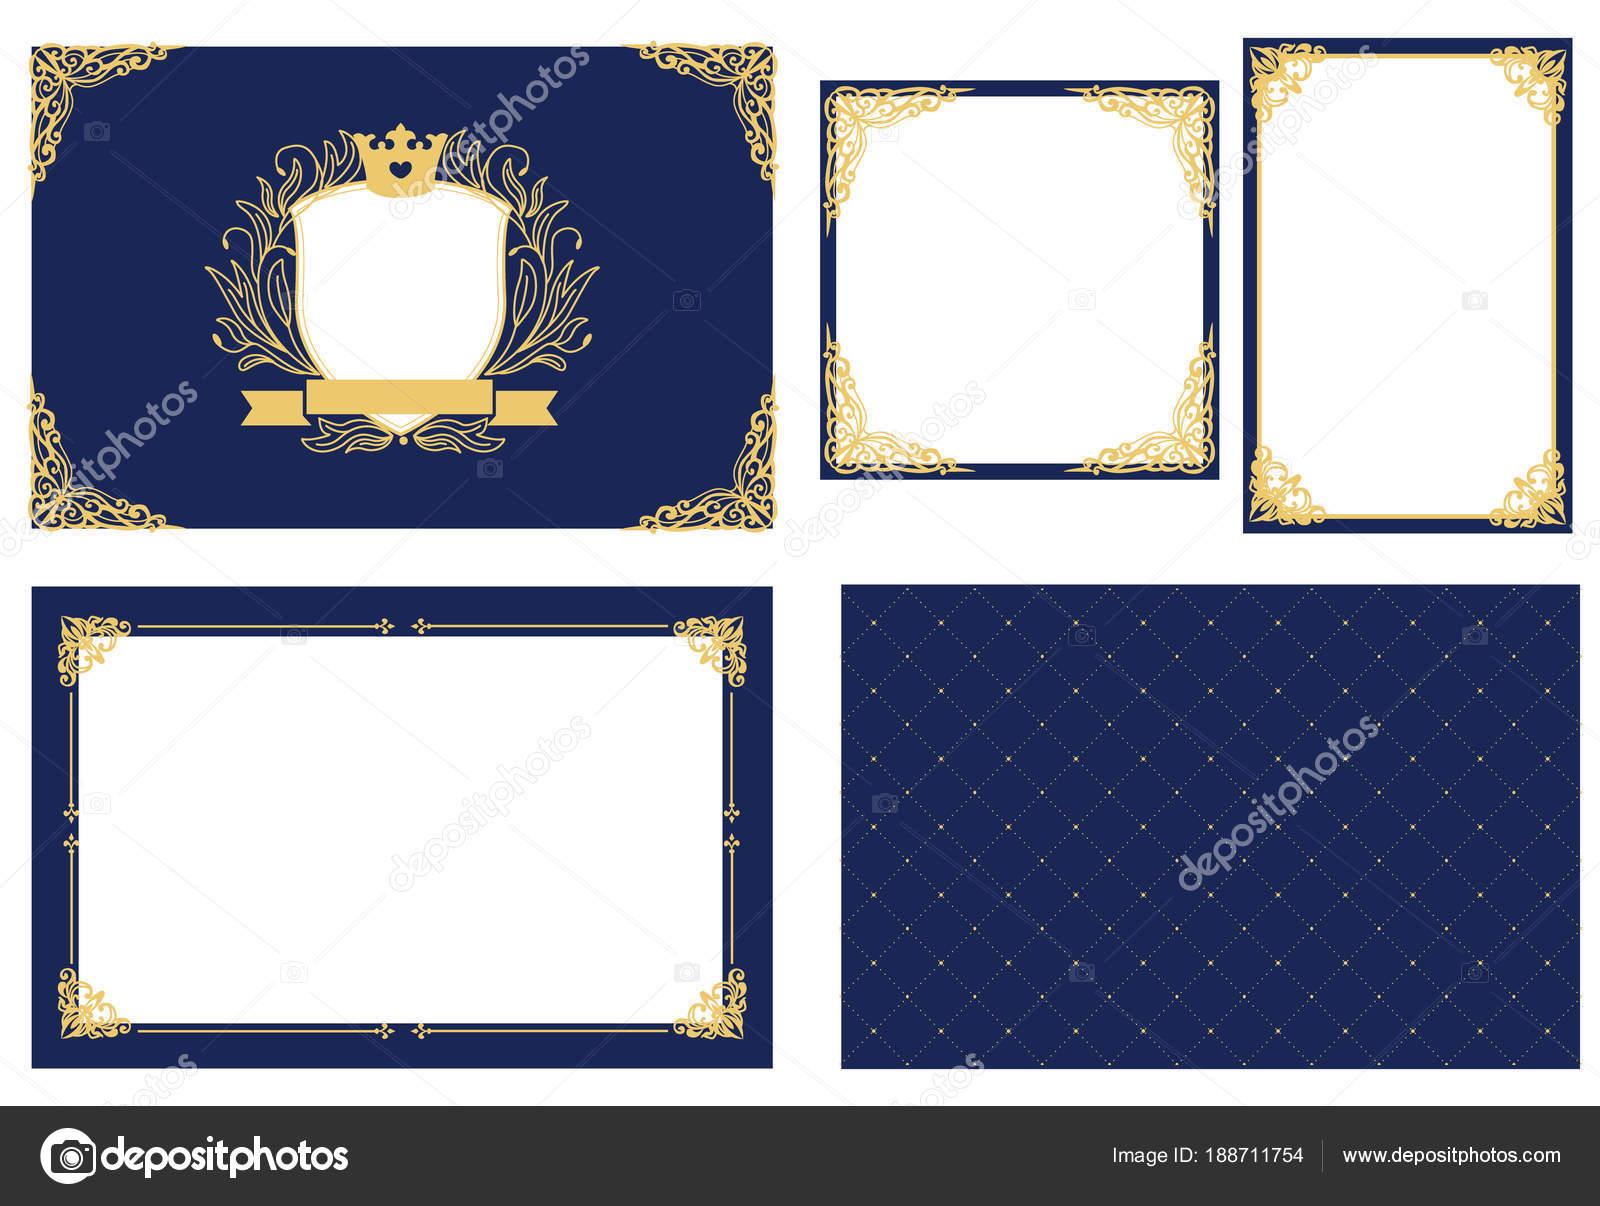 Conjunto Marco Imagen Vectorial Azul Marina Oro Esquina Decorativa ...